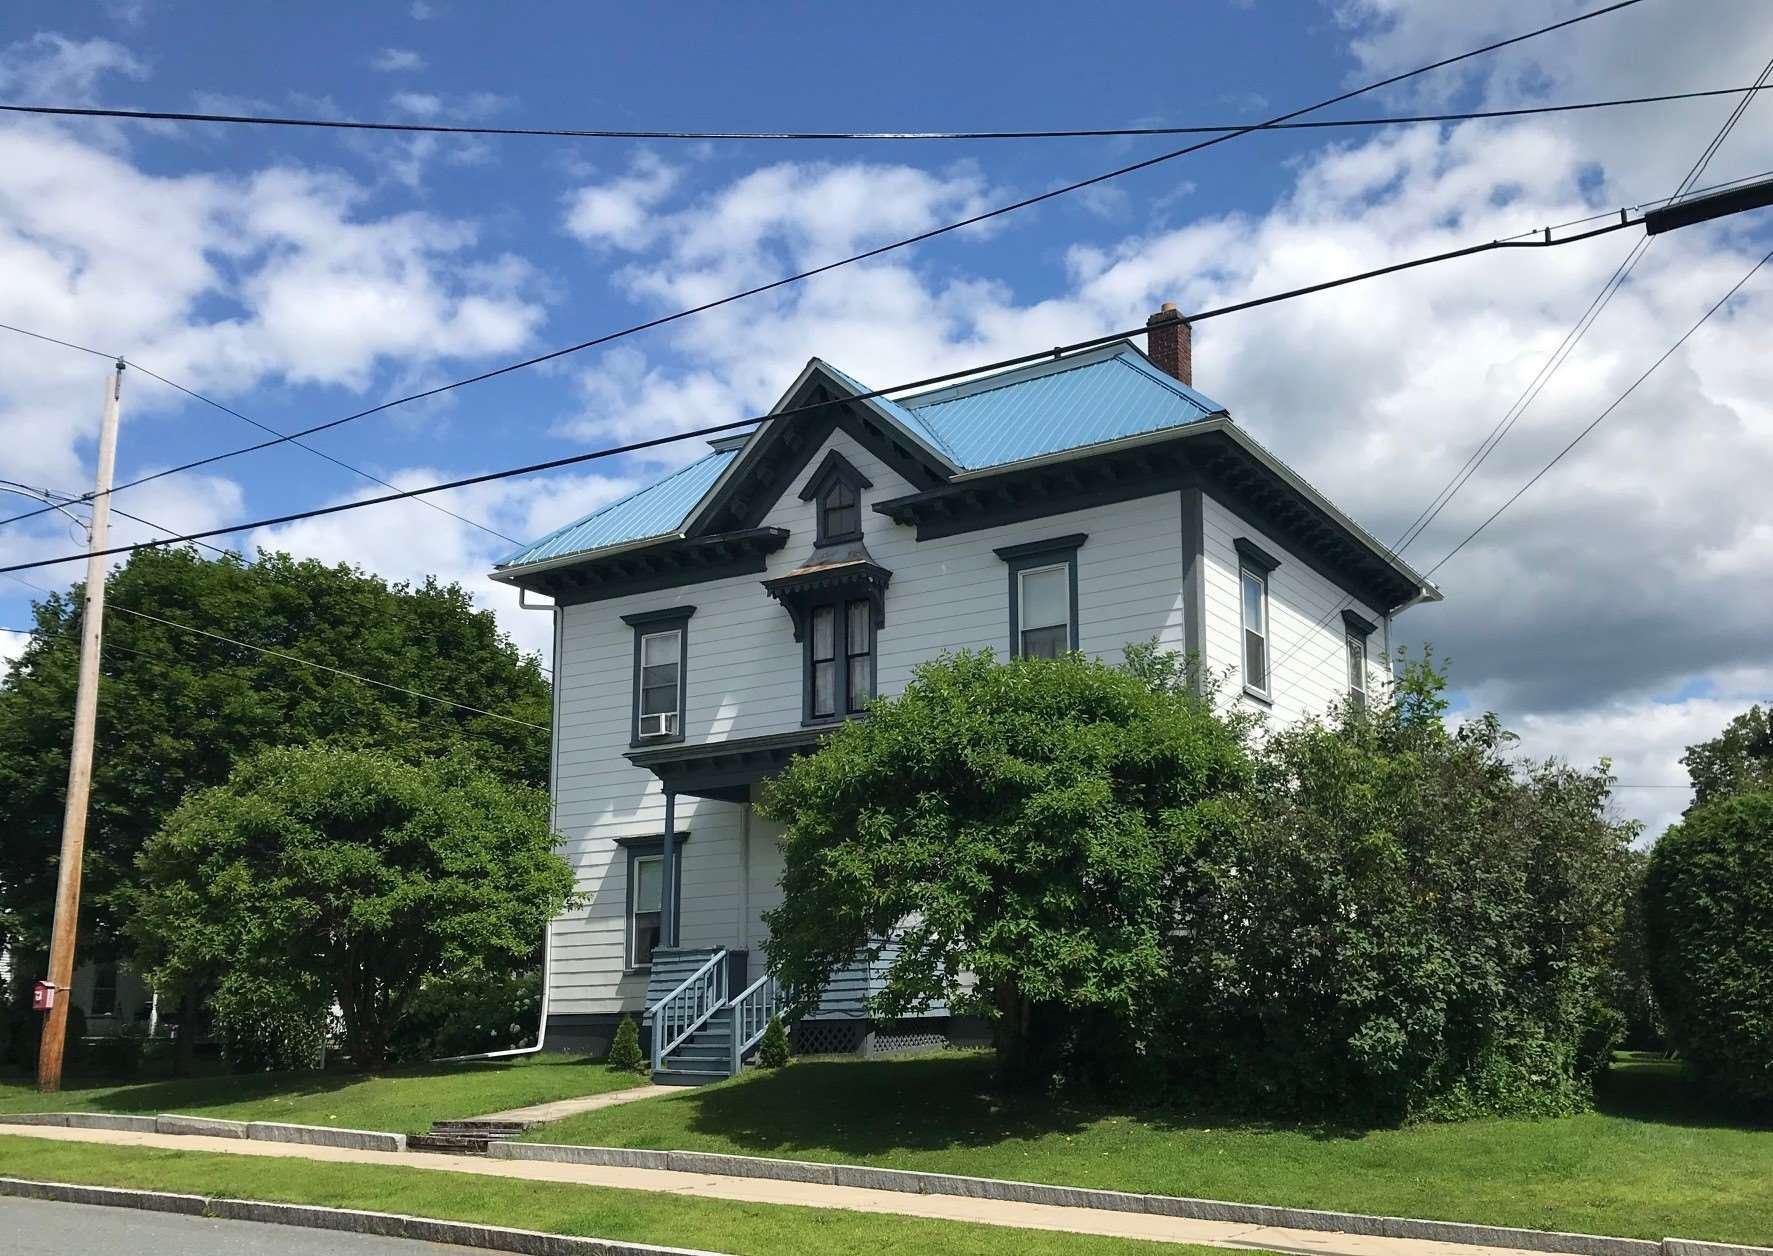 324 Cliff Street, Saint Johnsbury, VT 05819 - MLS#: 4824181